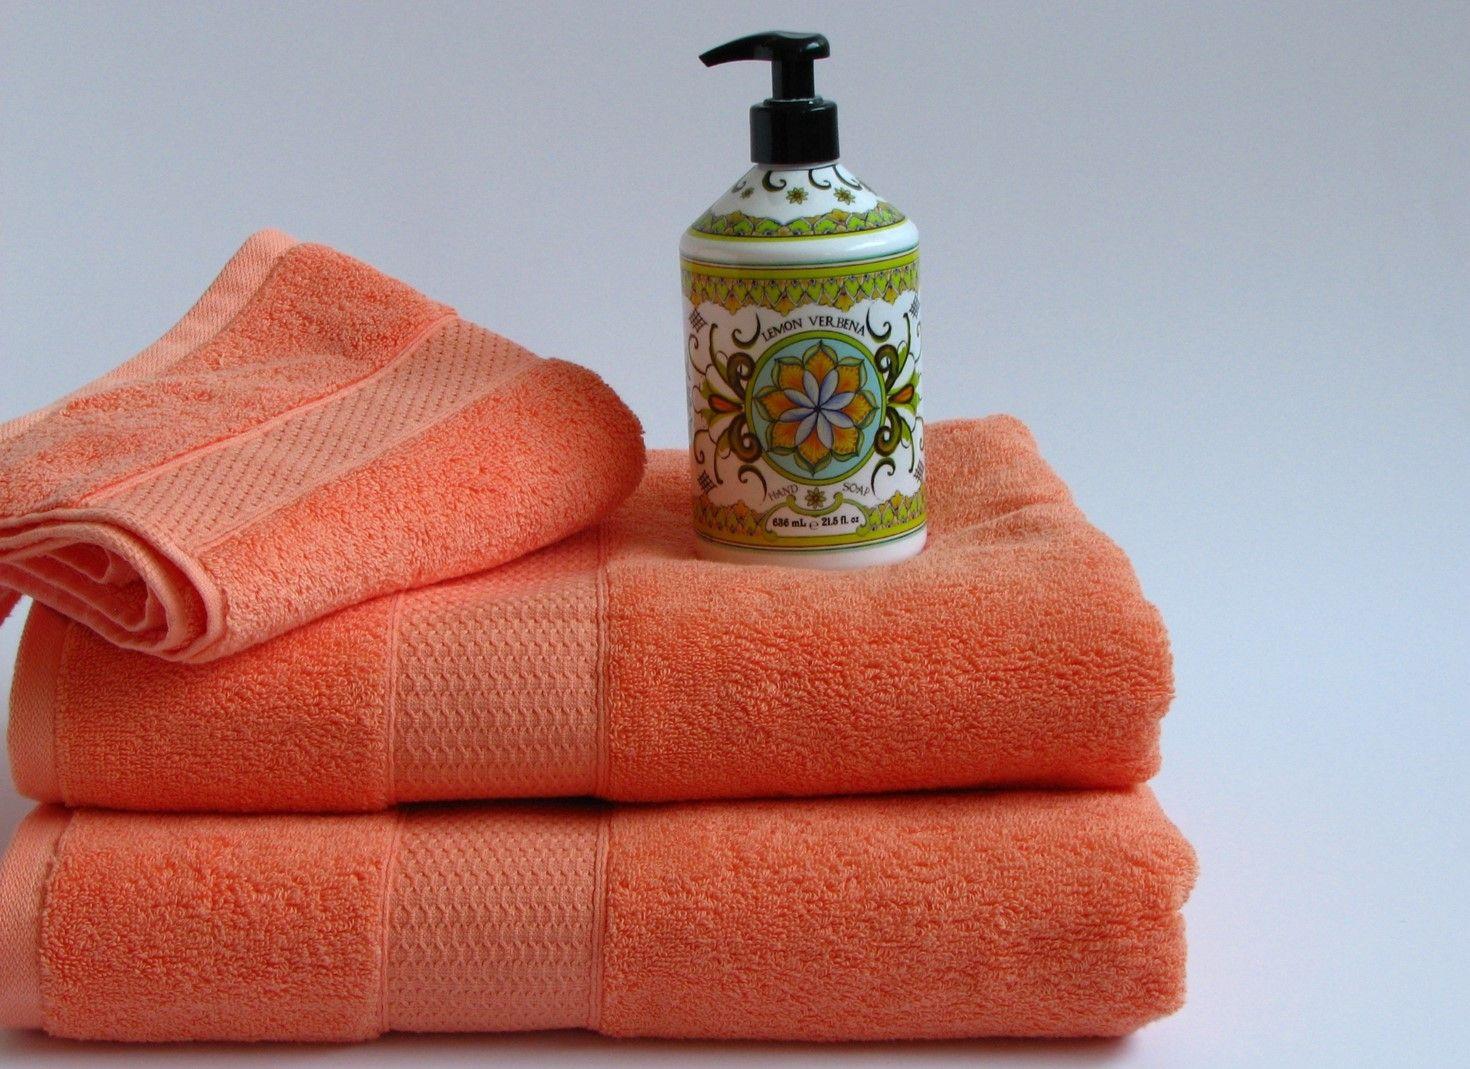 Vibrant Mandarin Bath Towels By Cynthia Rowley And Lemon Verbena